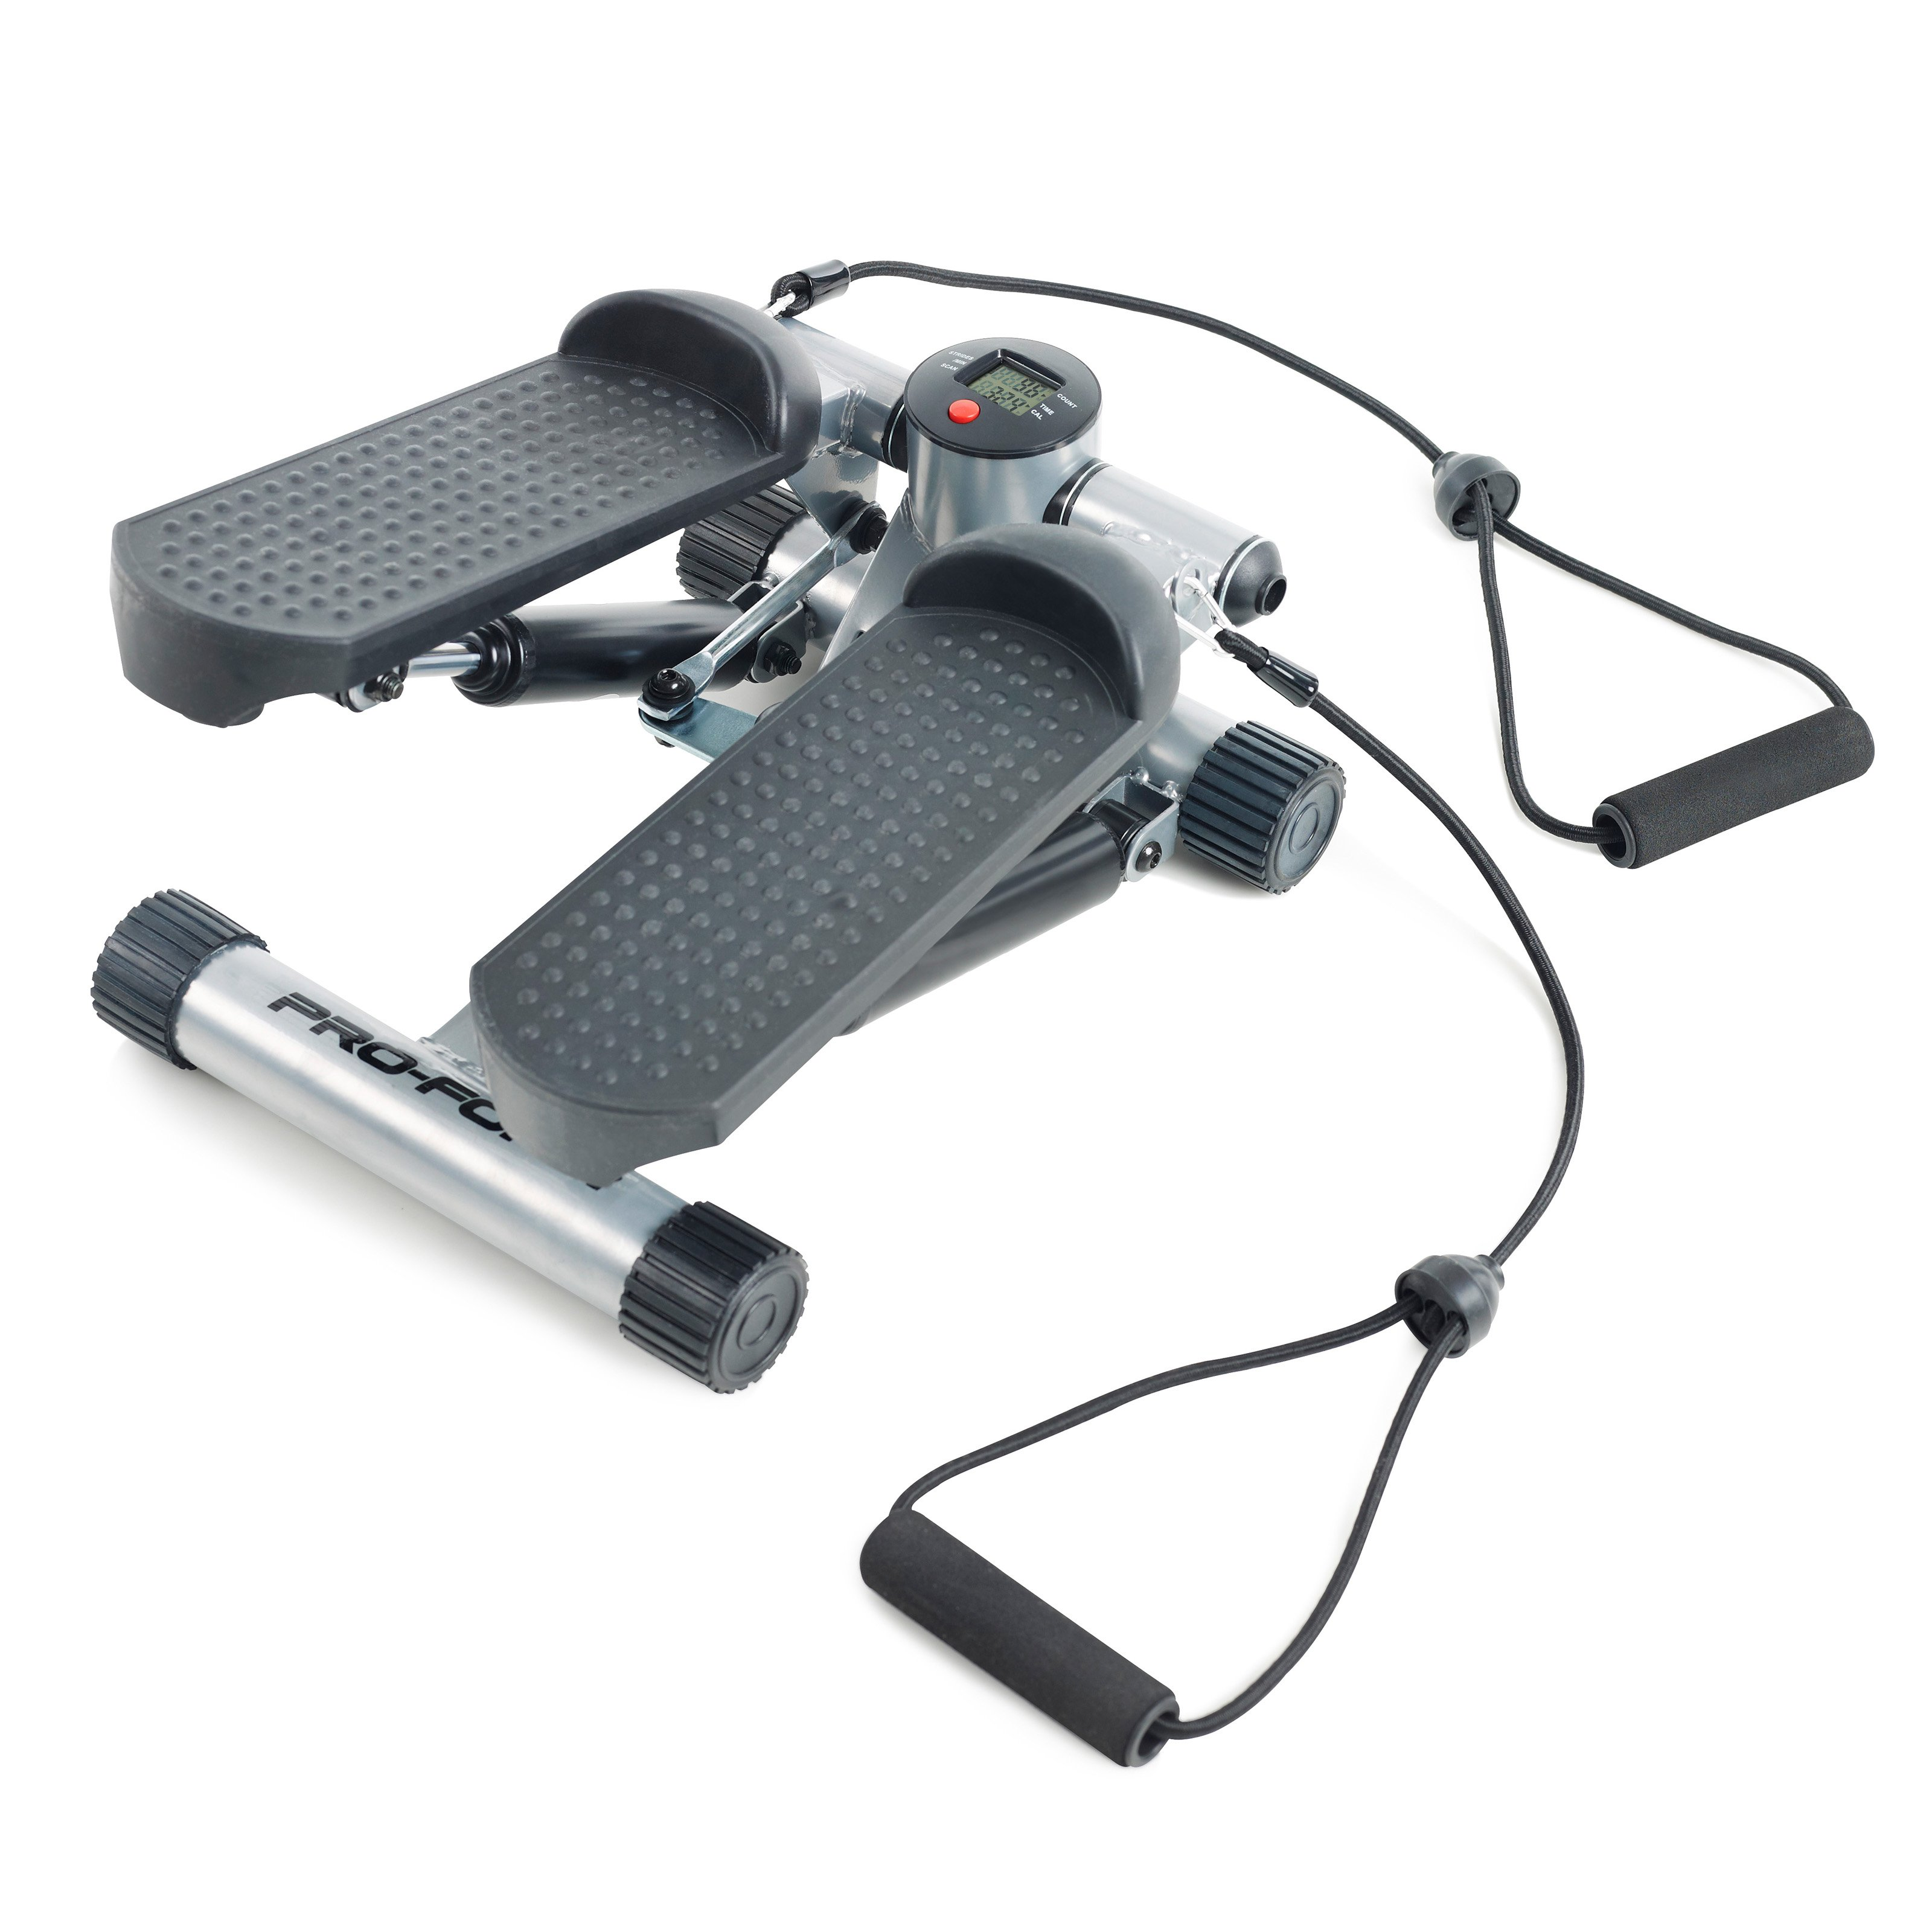 ProForm Mini Stepper with Adjustable Resistance Cords